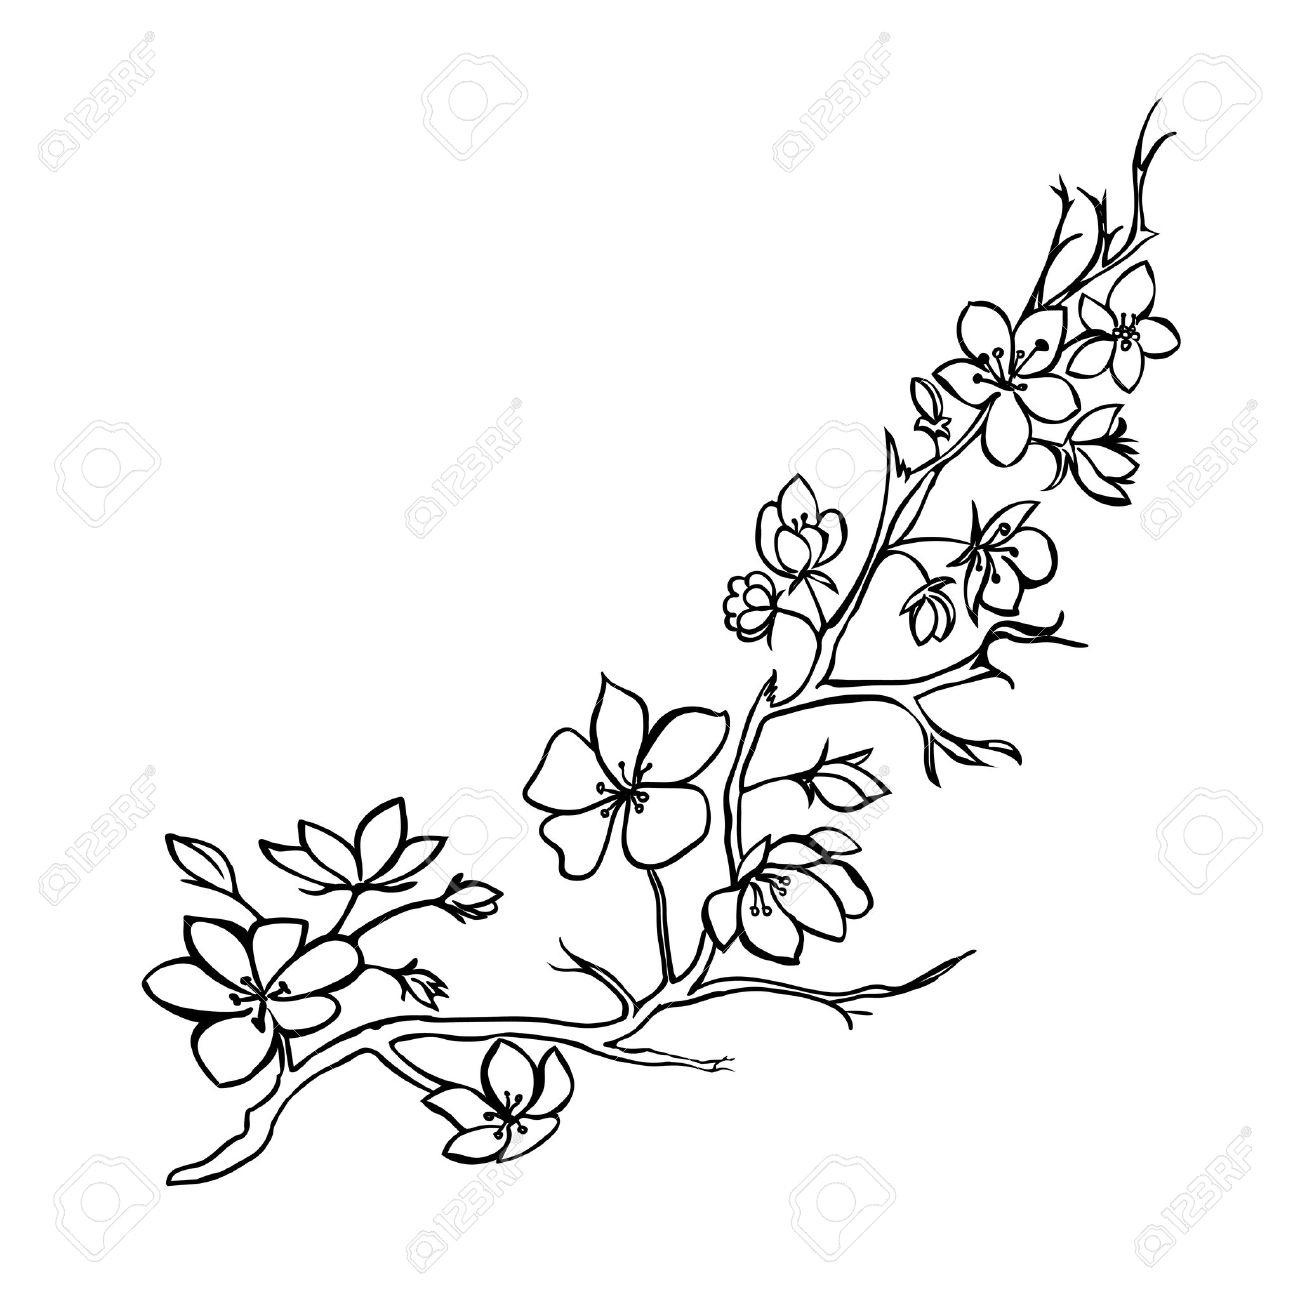 1300x1300 Sakura Flower Sketch Sketch. Twig Sakura Blossoms . Vector